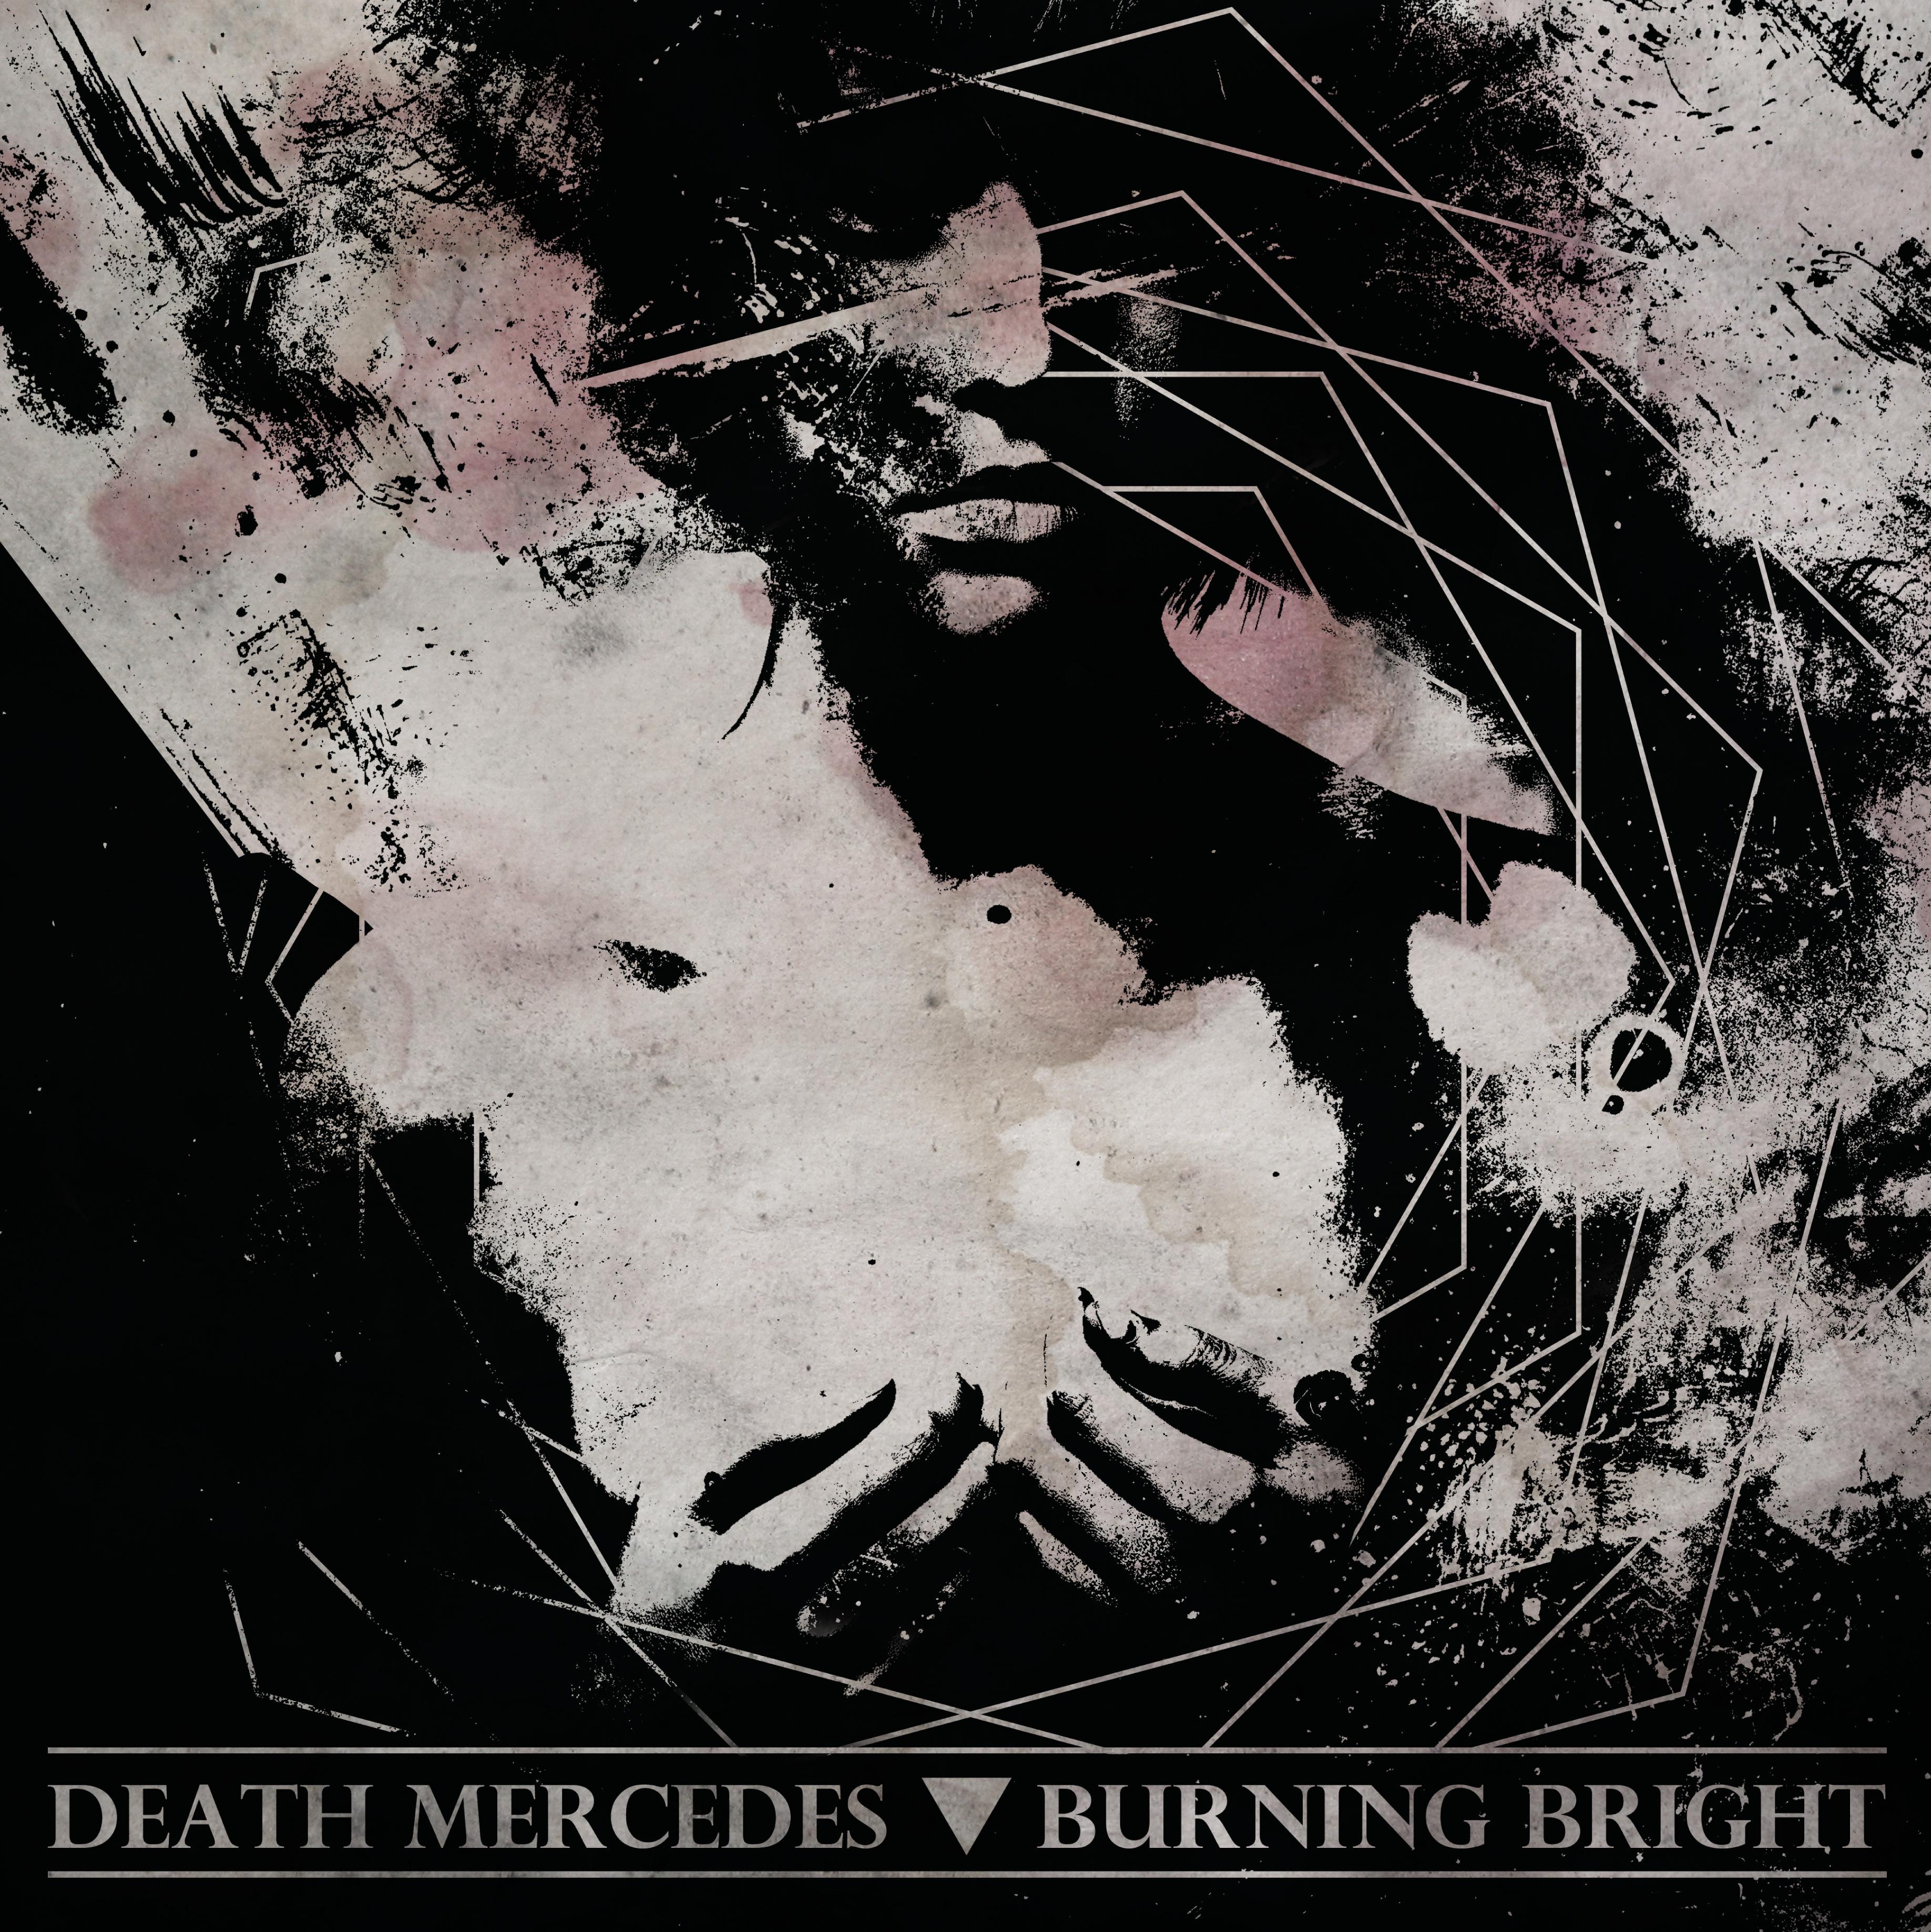 DeathMercedesBurningBright